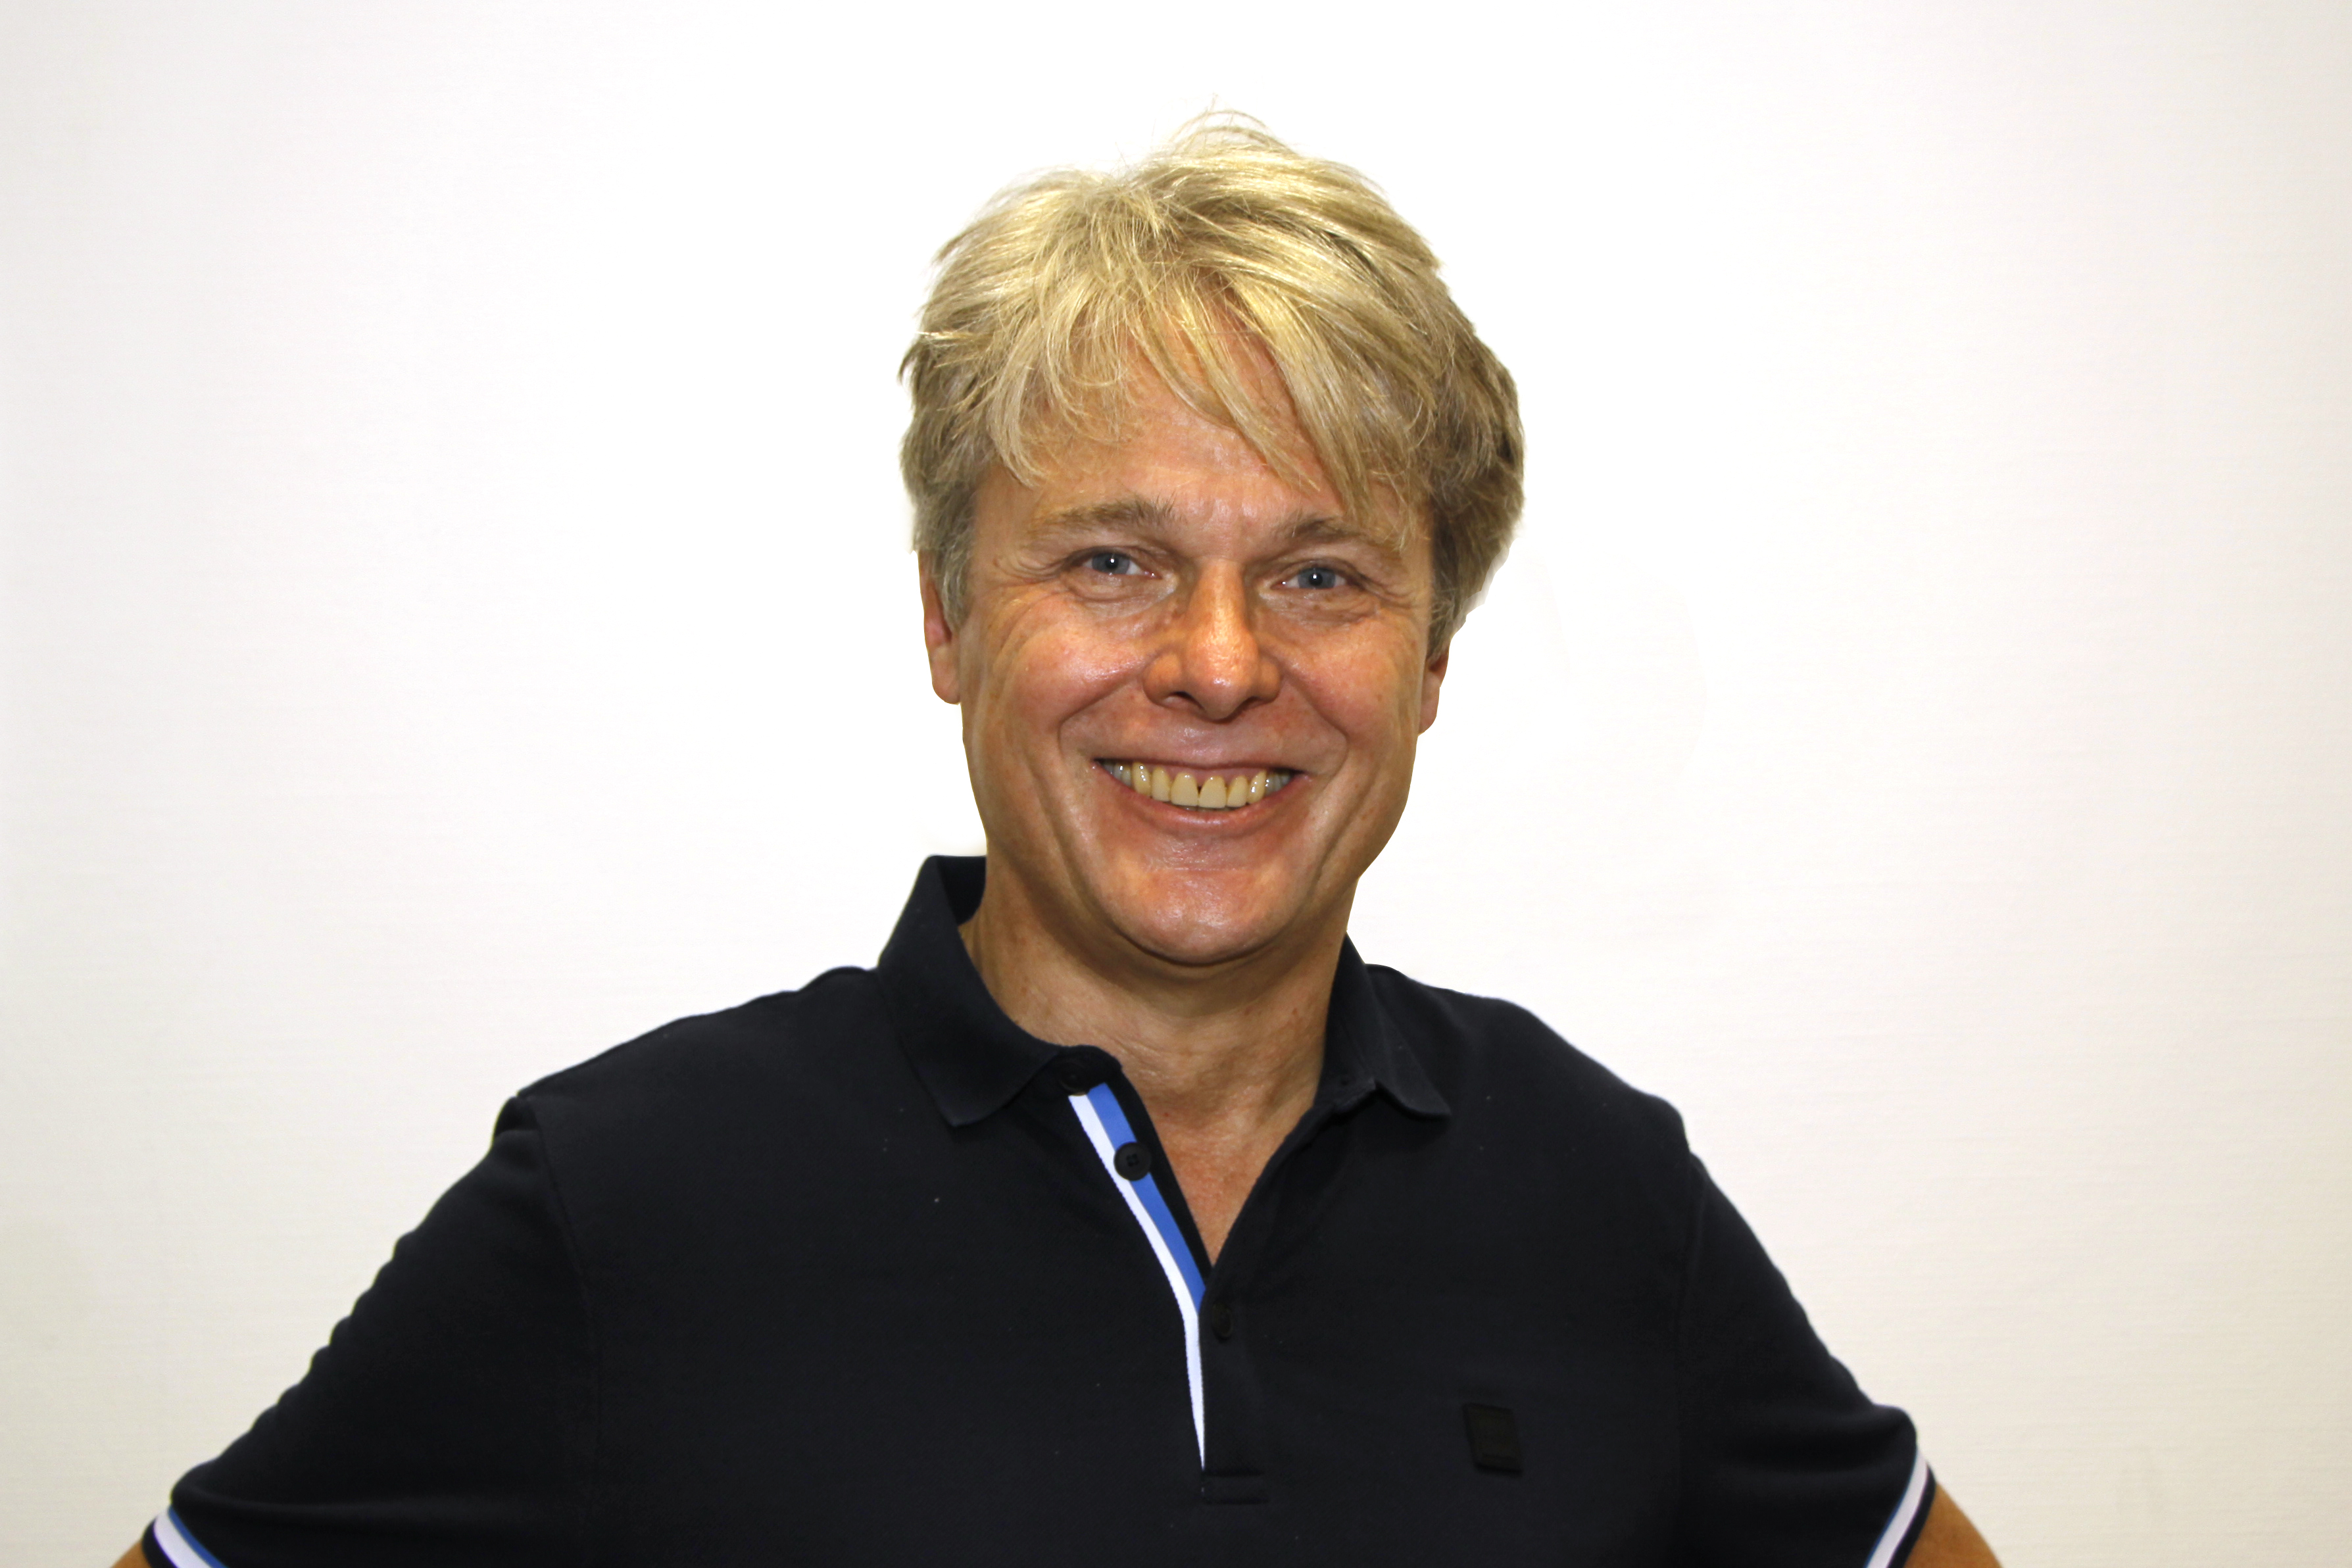 Dr. Andreas Röhrle - Apotheker & Experte für Medikationsmanagment